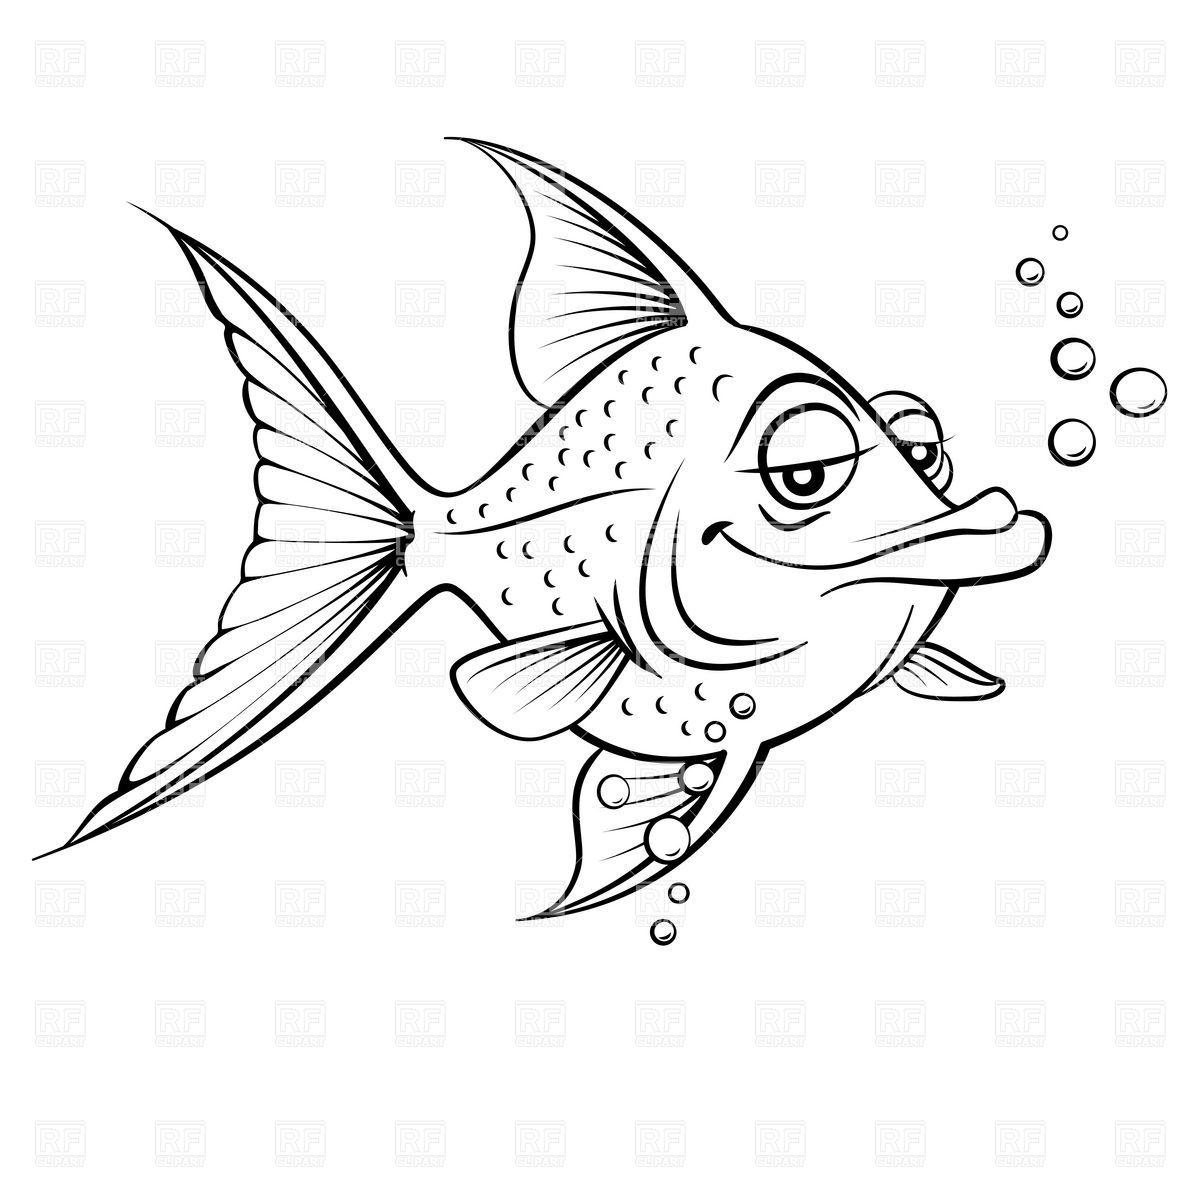 Uncategorized Cartoon Fish Drawings funny cartoon fish google pesciolino sporcaccione google